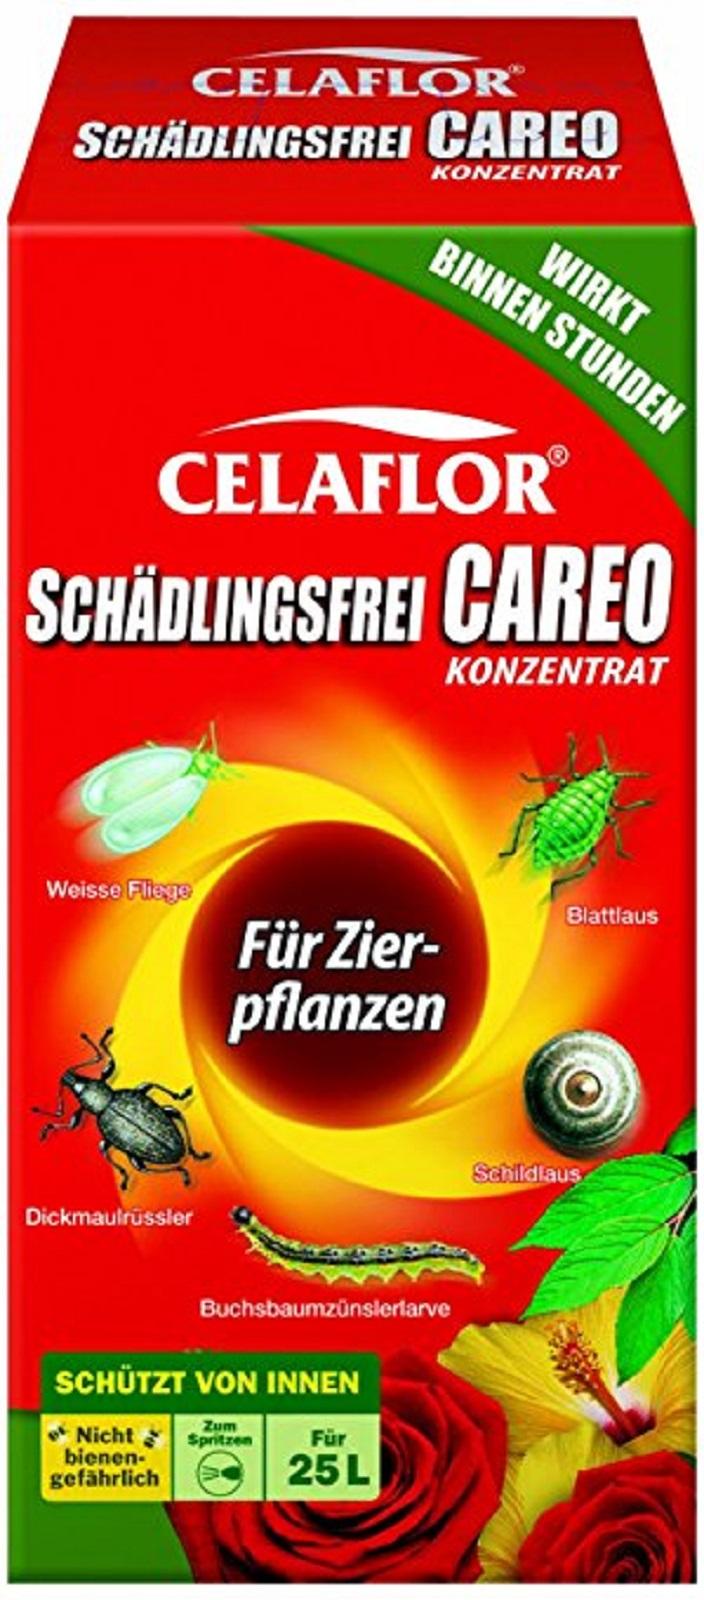 Celaflor Schädlingsfrei CAREO Konzentrat 250 ml